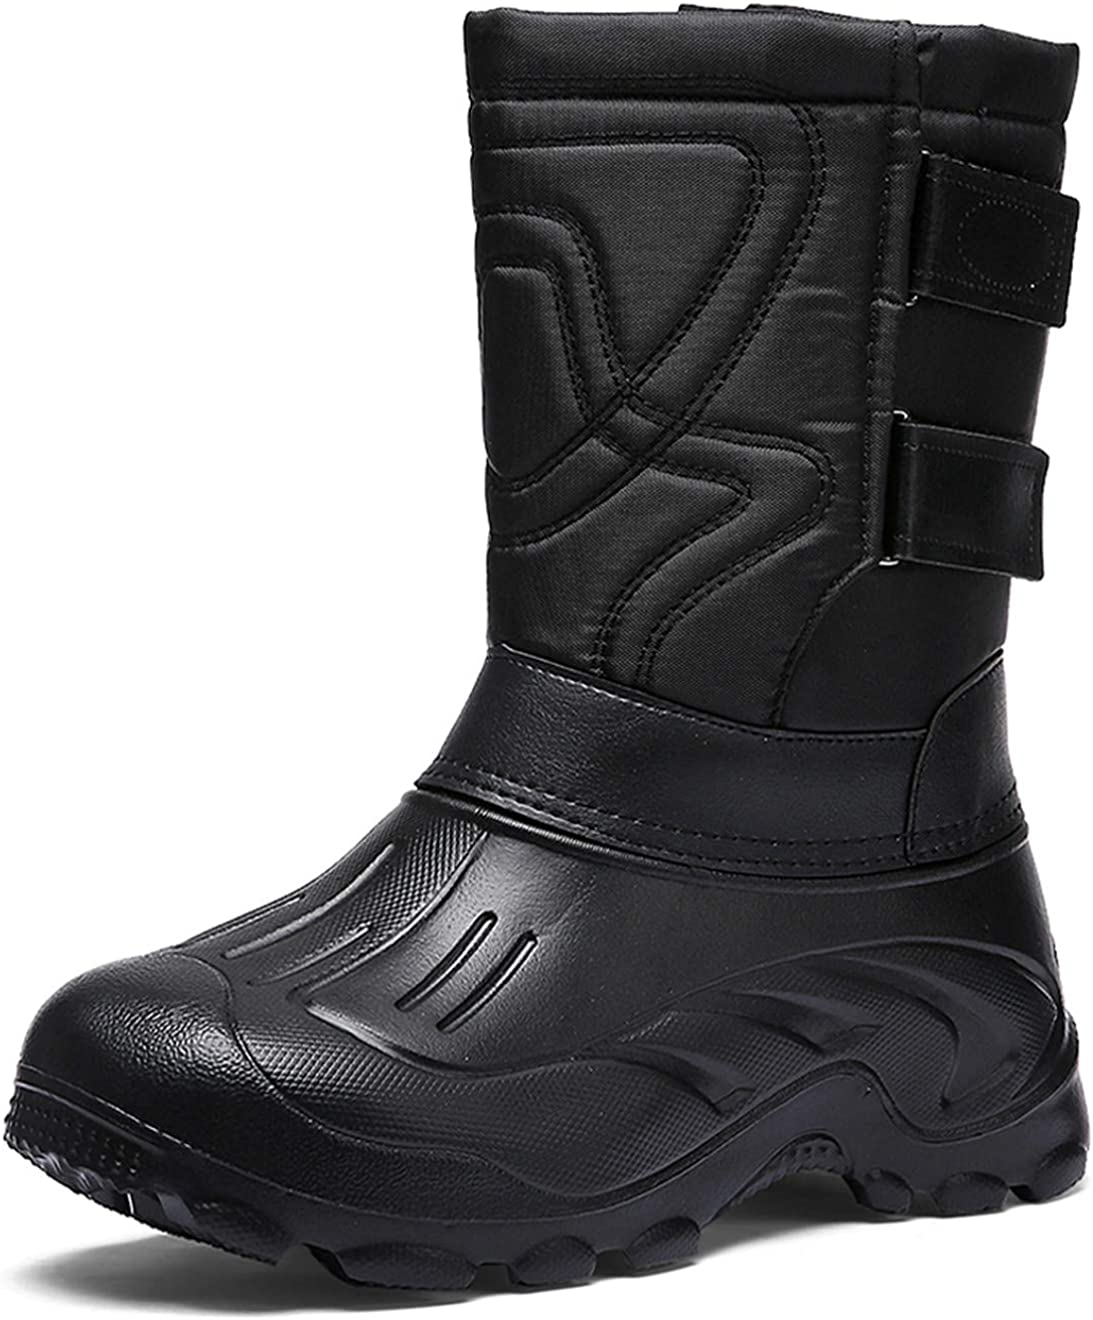 TENGTA Winter Warm Fur Lined Snow Boots